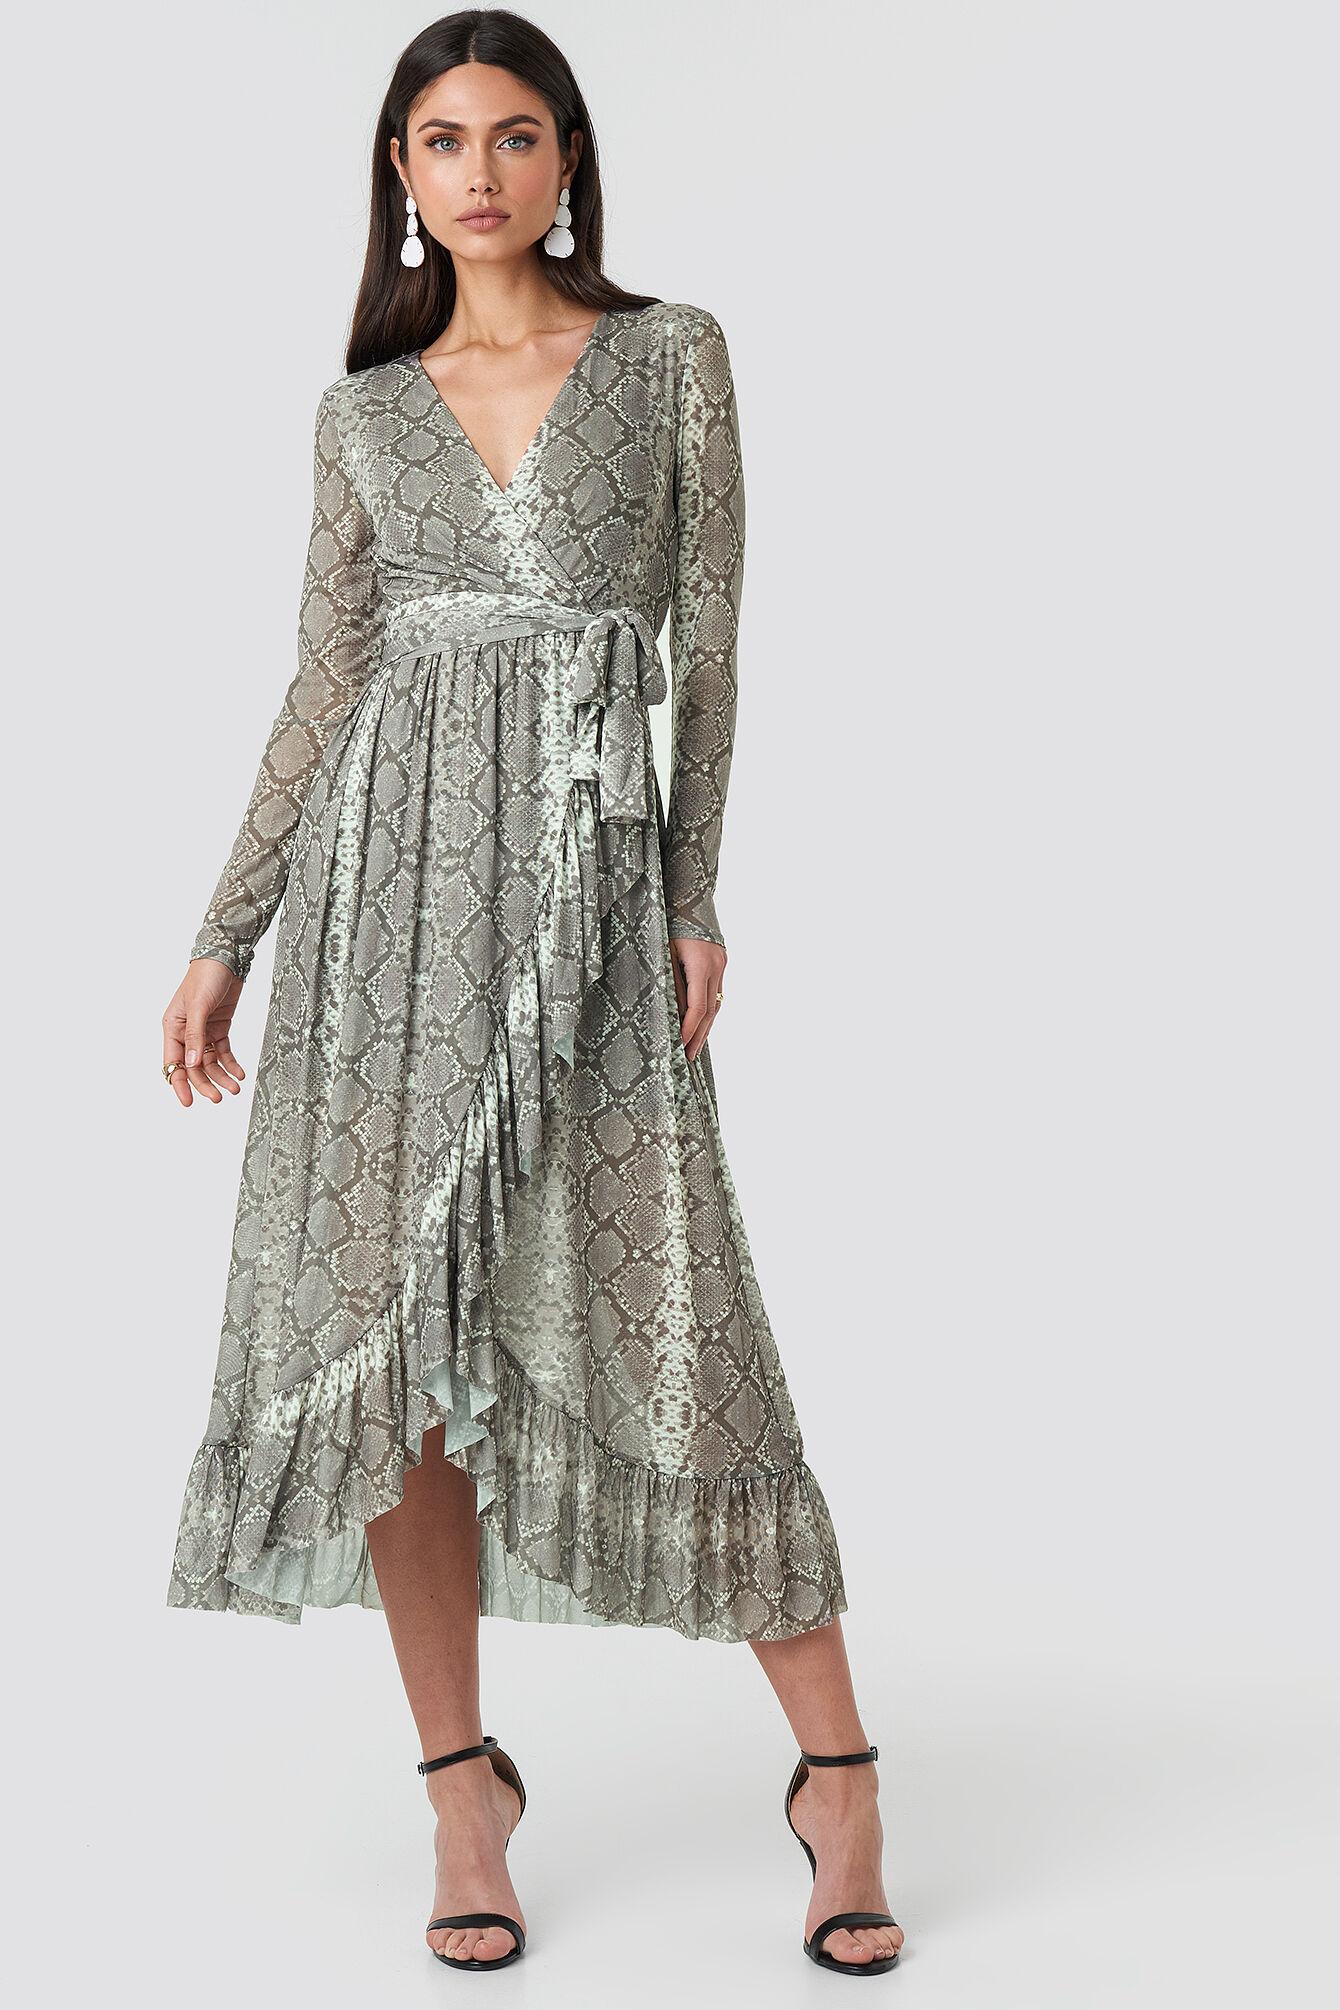 Image of NA-KD Trend Mesh Printed Frill Maxi Dress - Grey,Multicolor